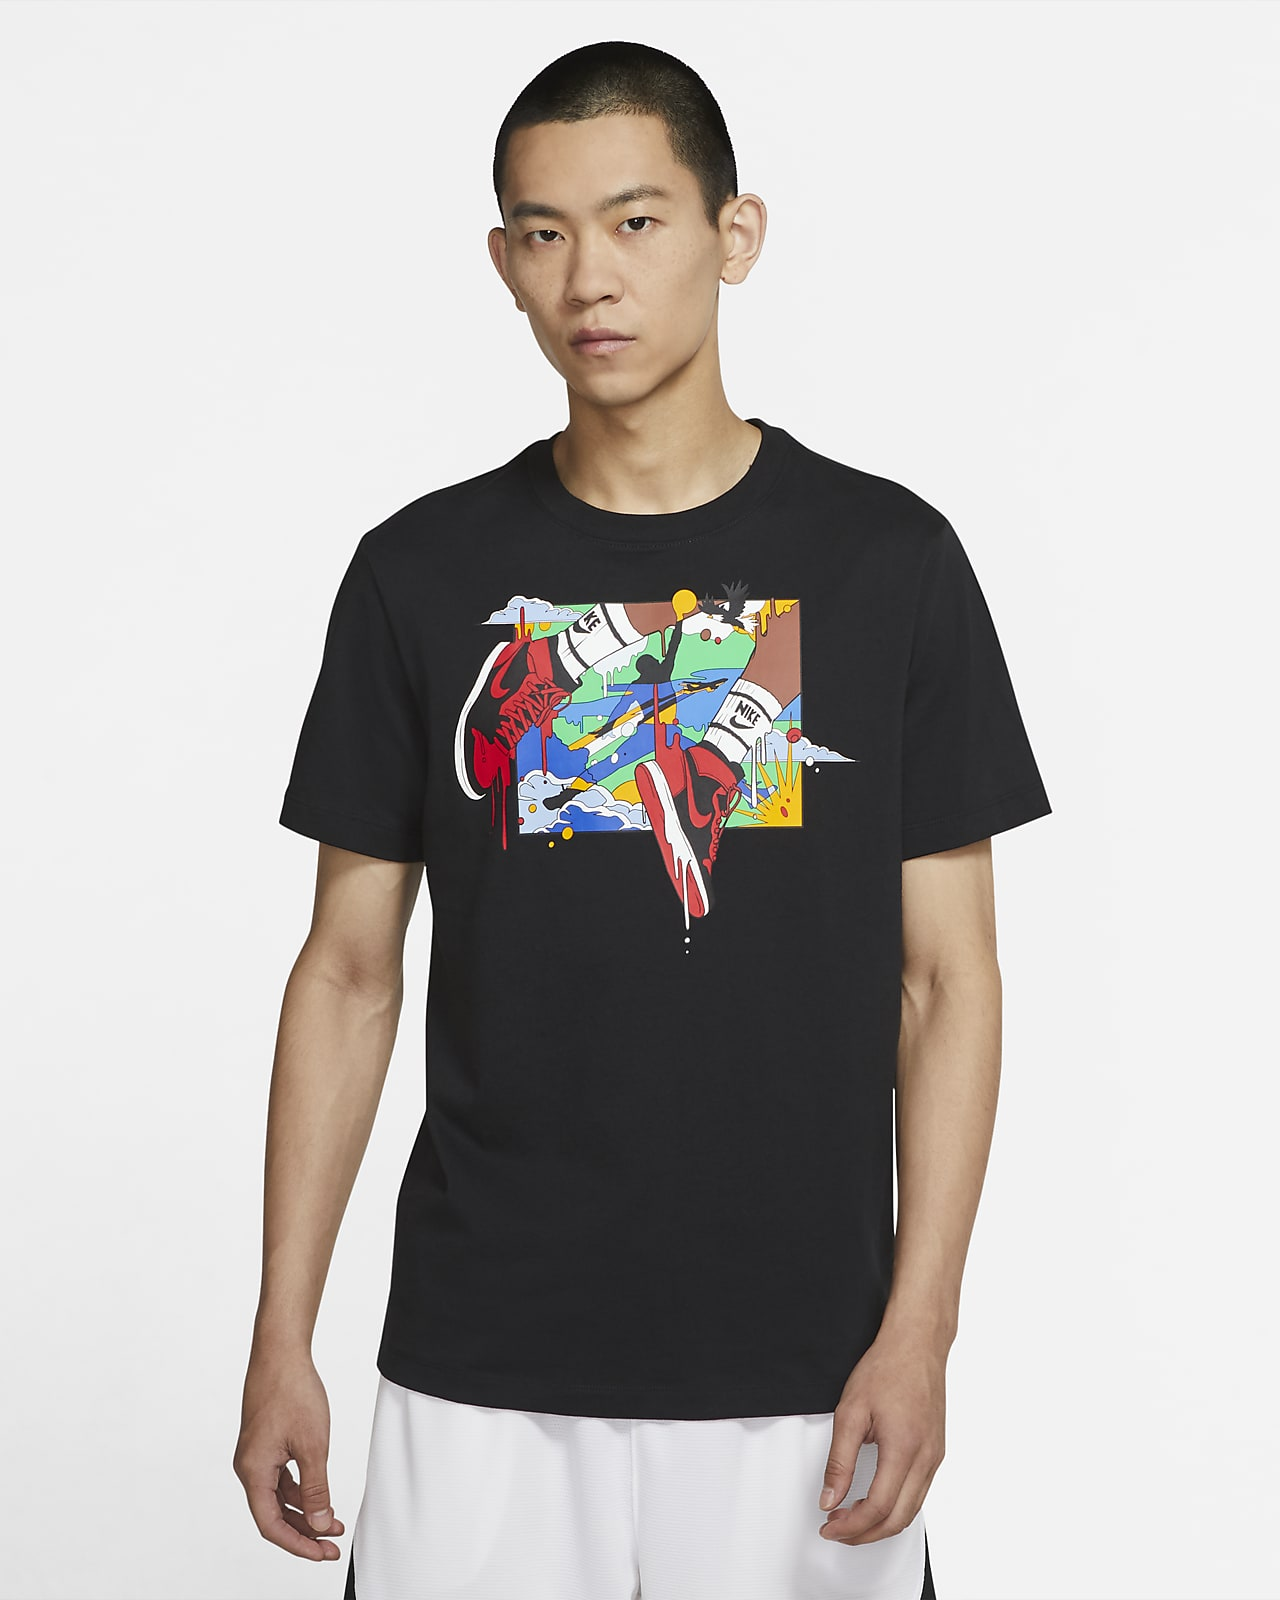 Air Jordan 1 Men's T-Shirt